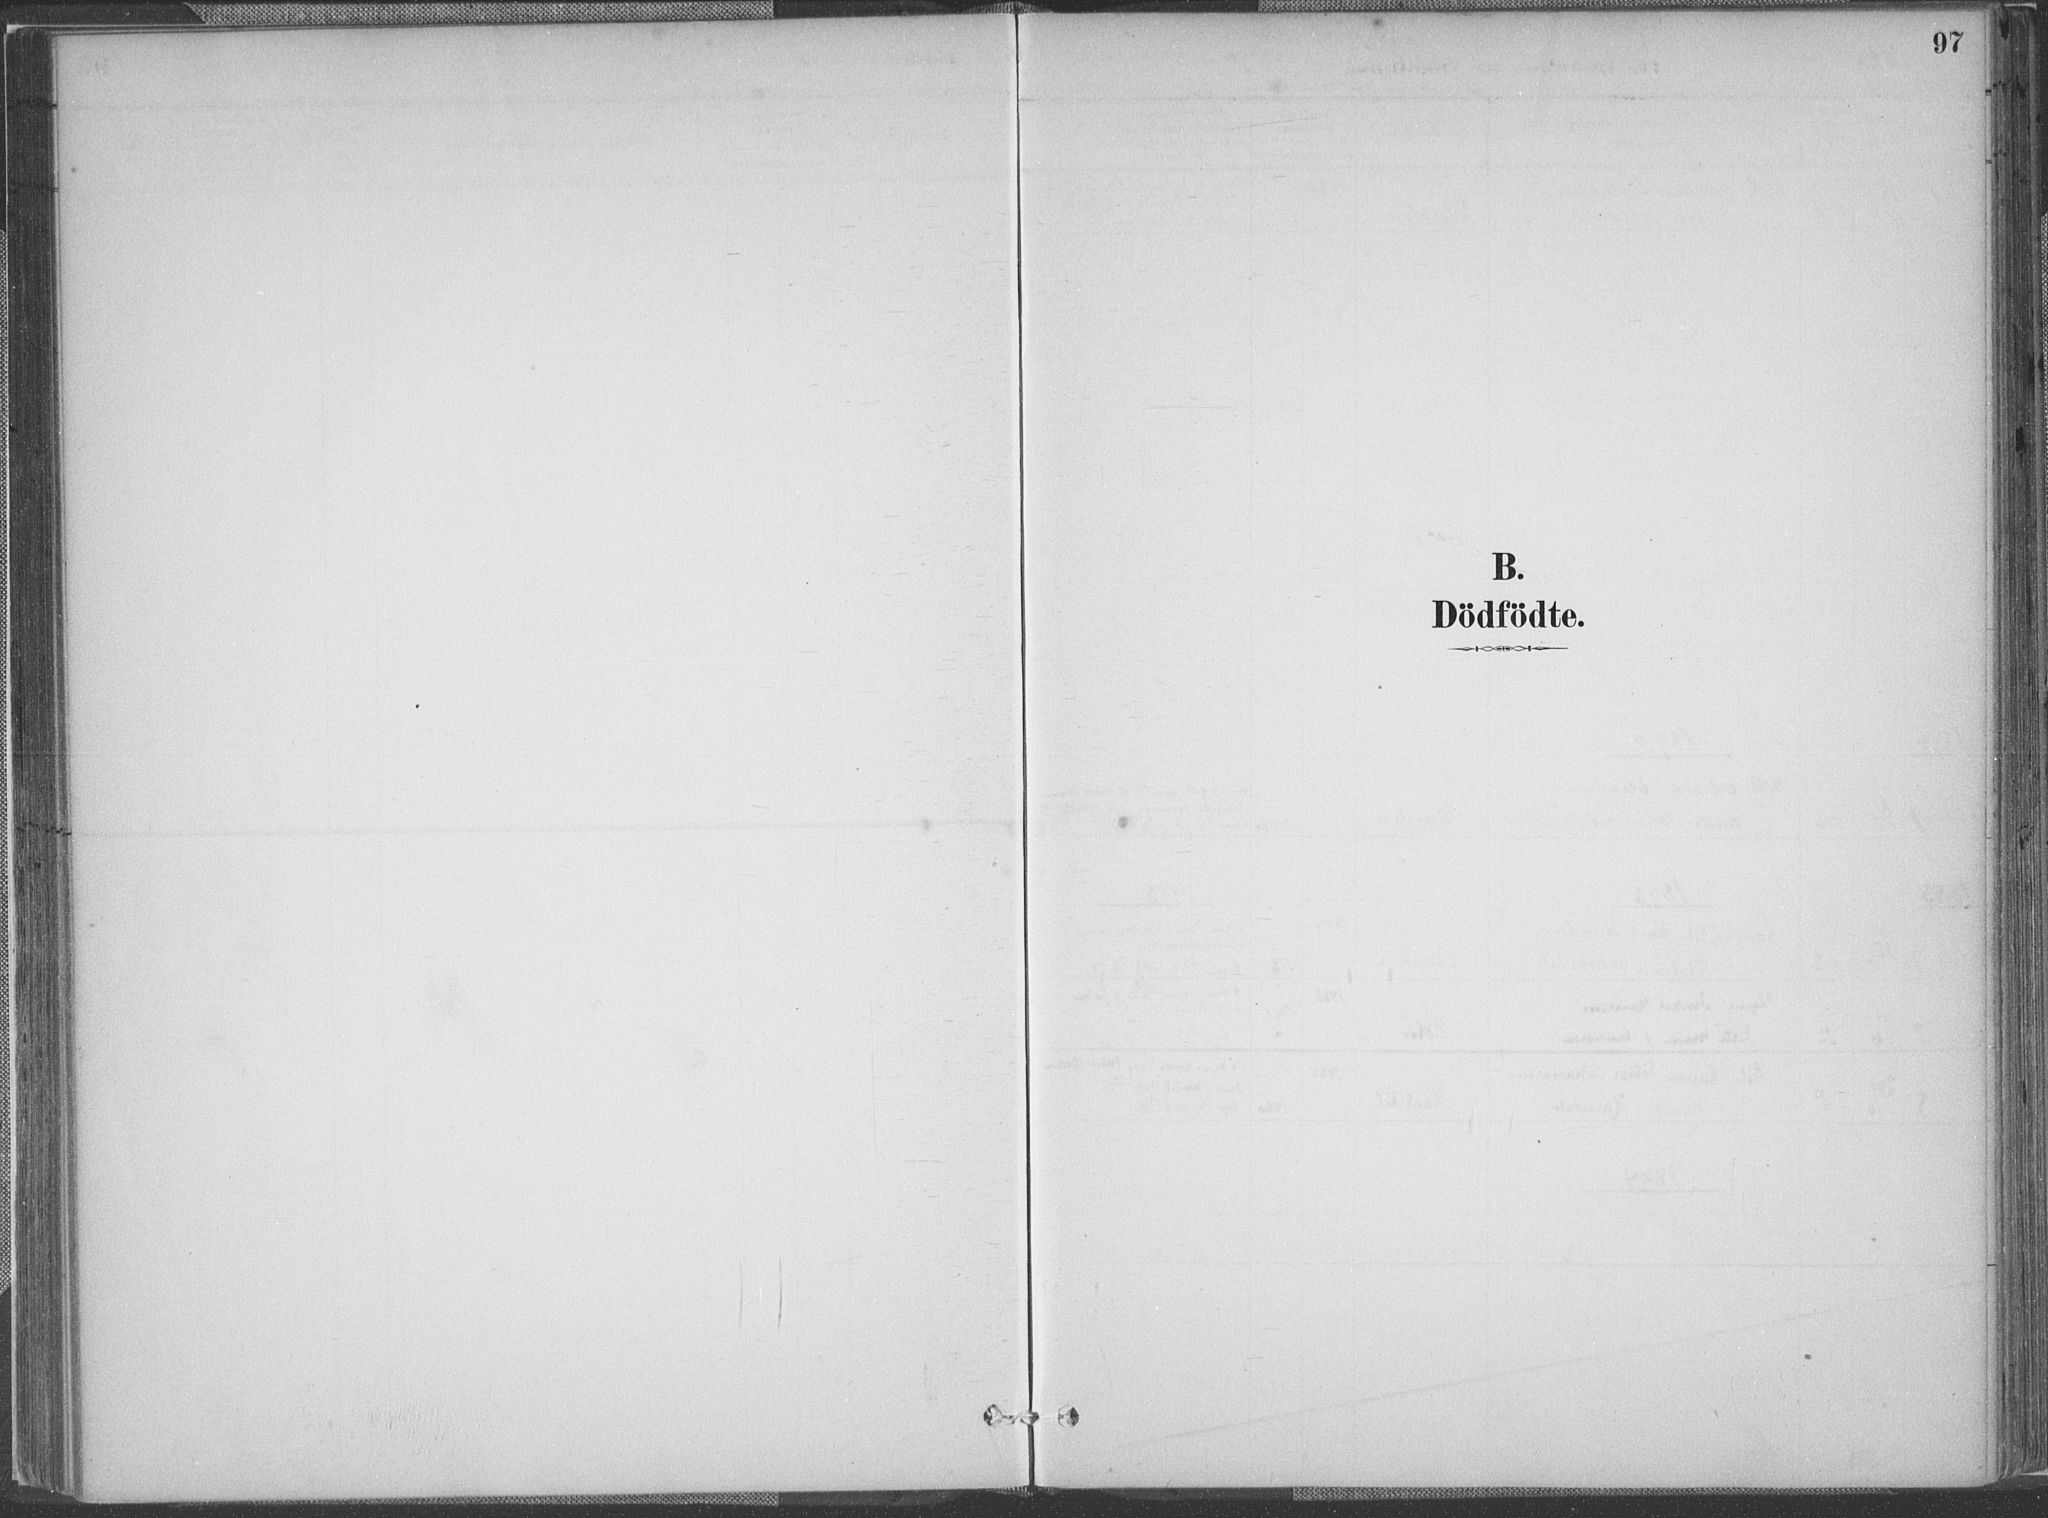 SAK, Lyngdal sokneprestkontor, F/Fa/Faa/L0004: Ministerialbok nr. A 4, 1883-1904, s. 97